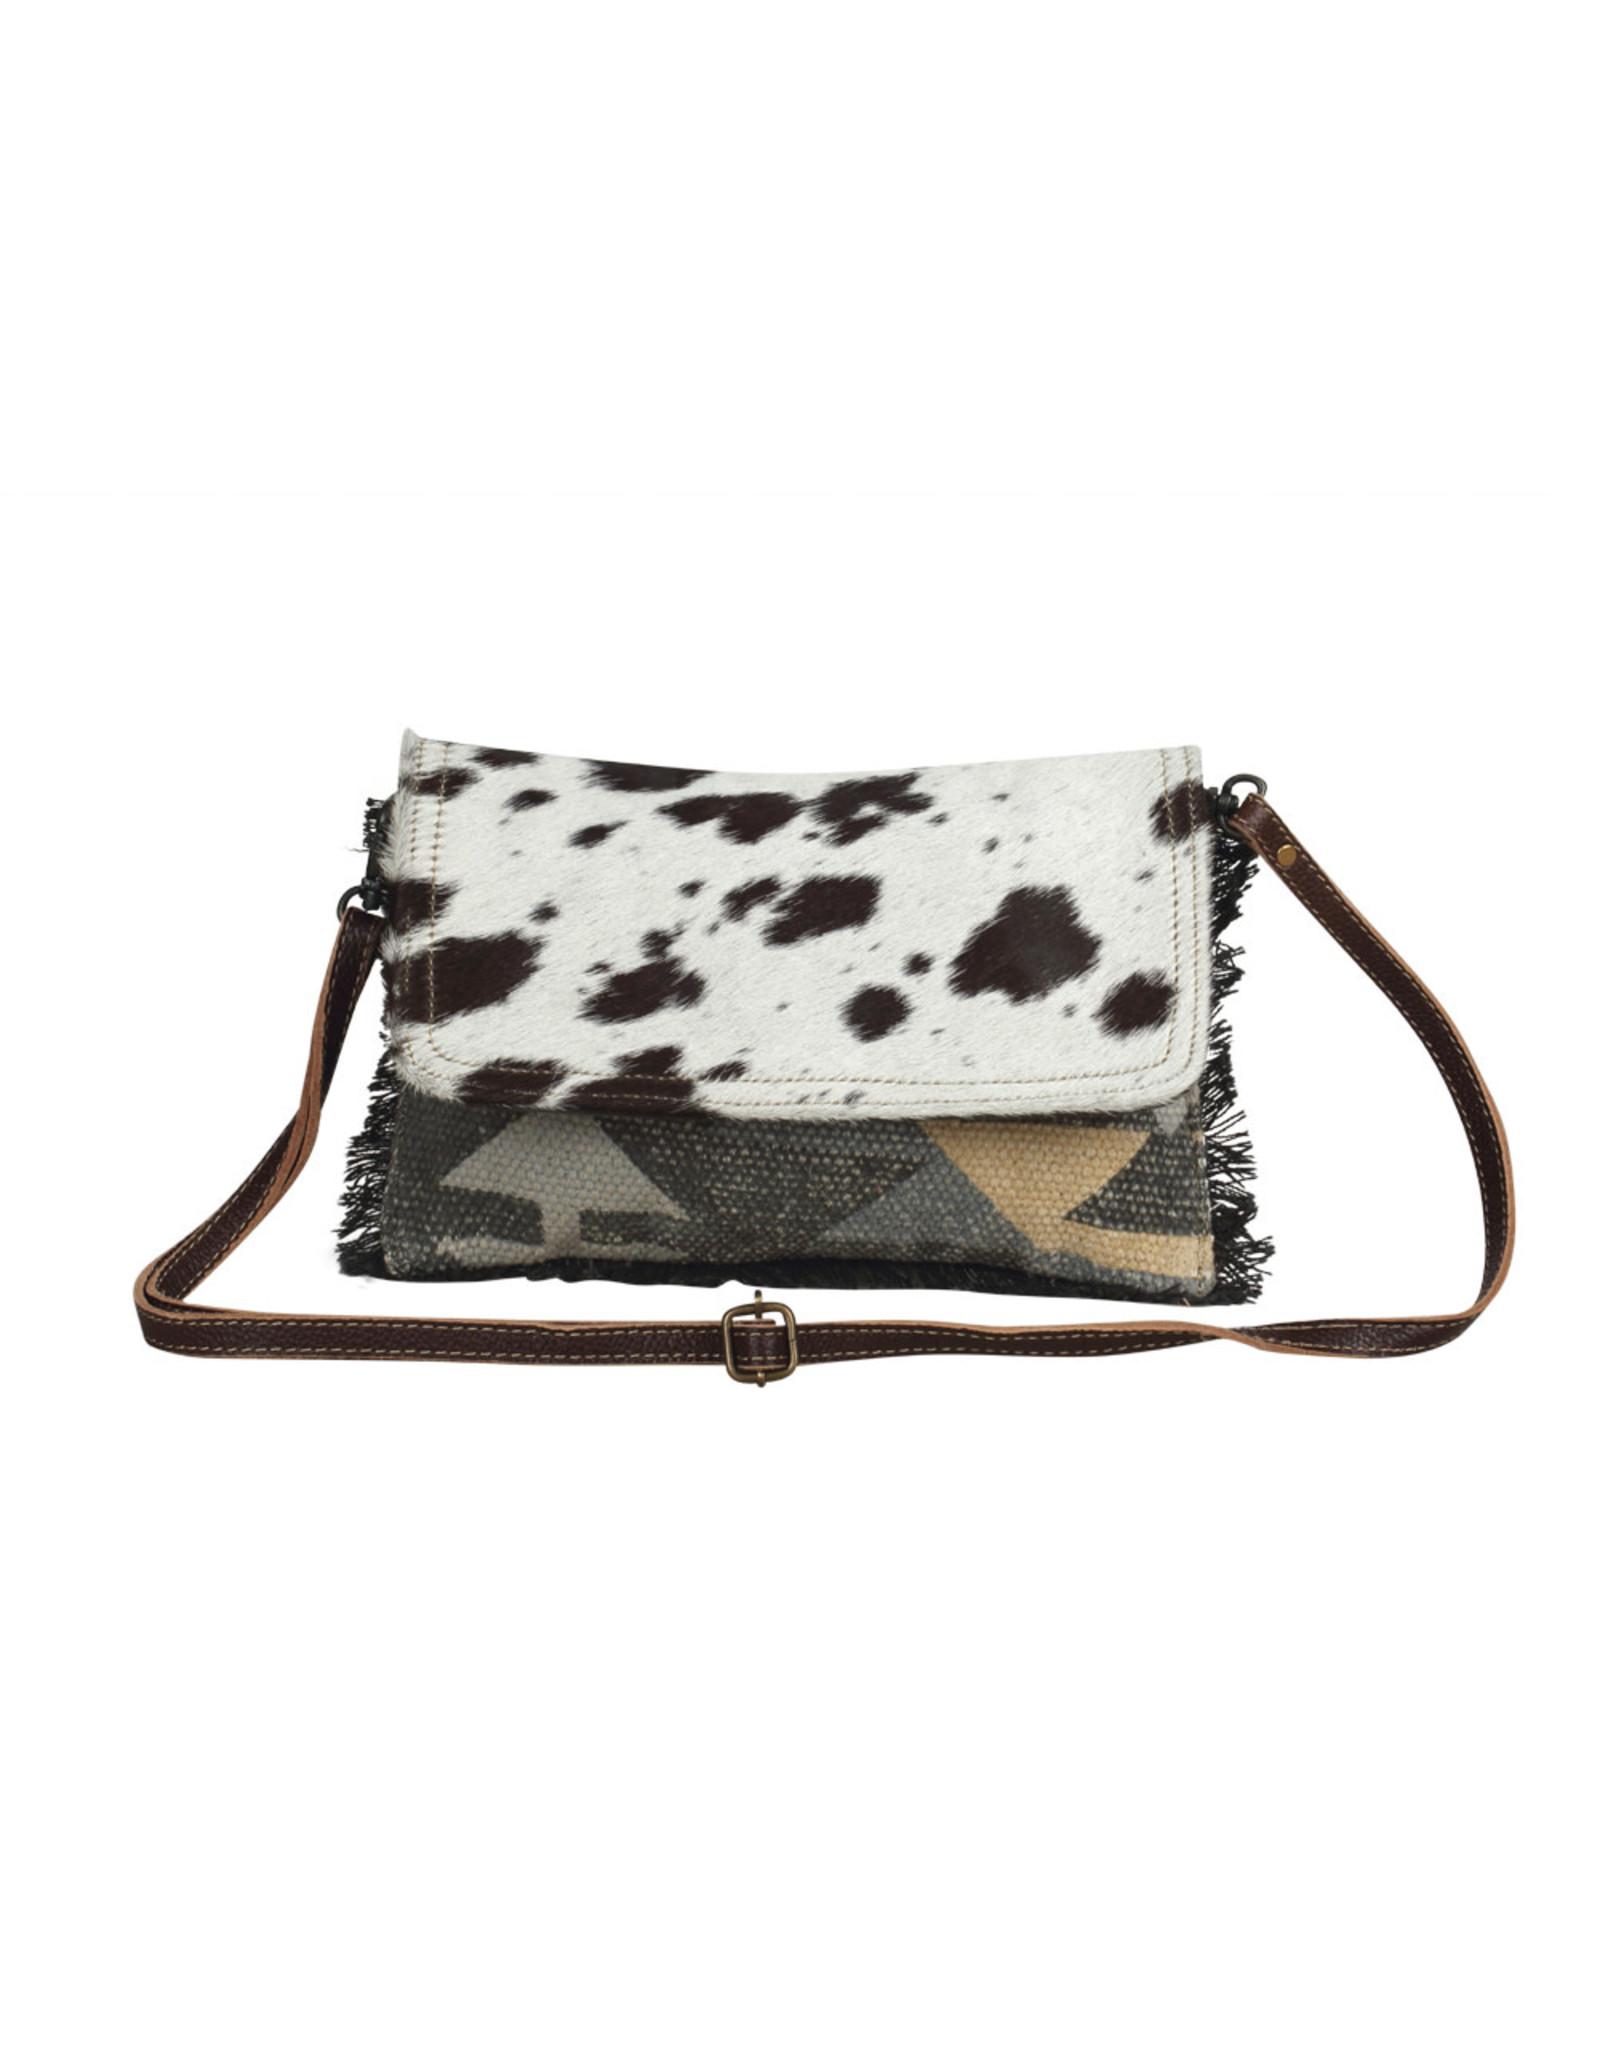 Myra Bags S-2076 Slingshot Small & Crossbody Bag